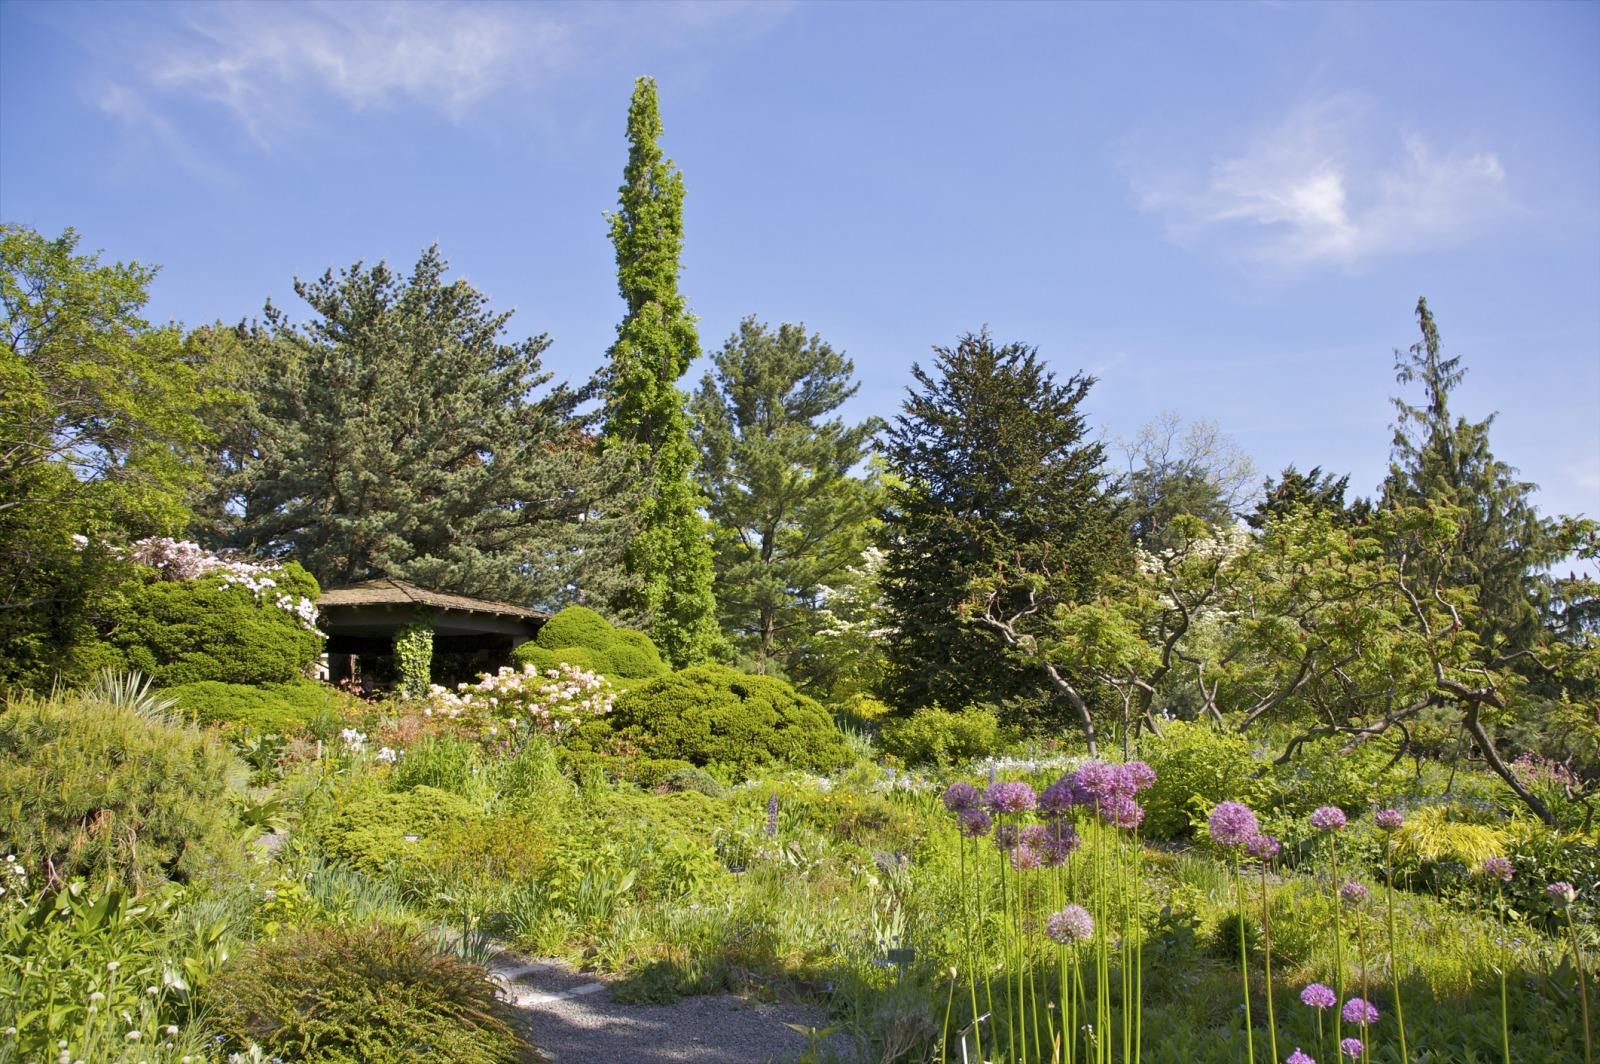 lush greenery in Wave Hill Garden in Riverdale, Bronx